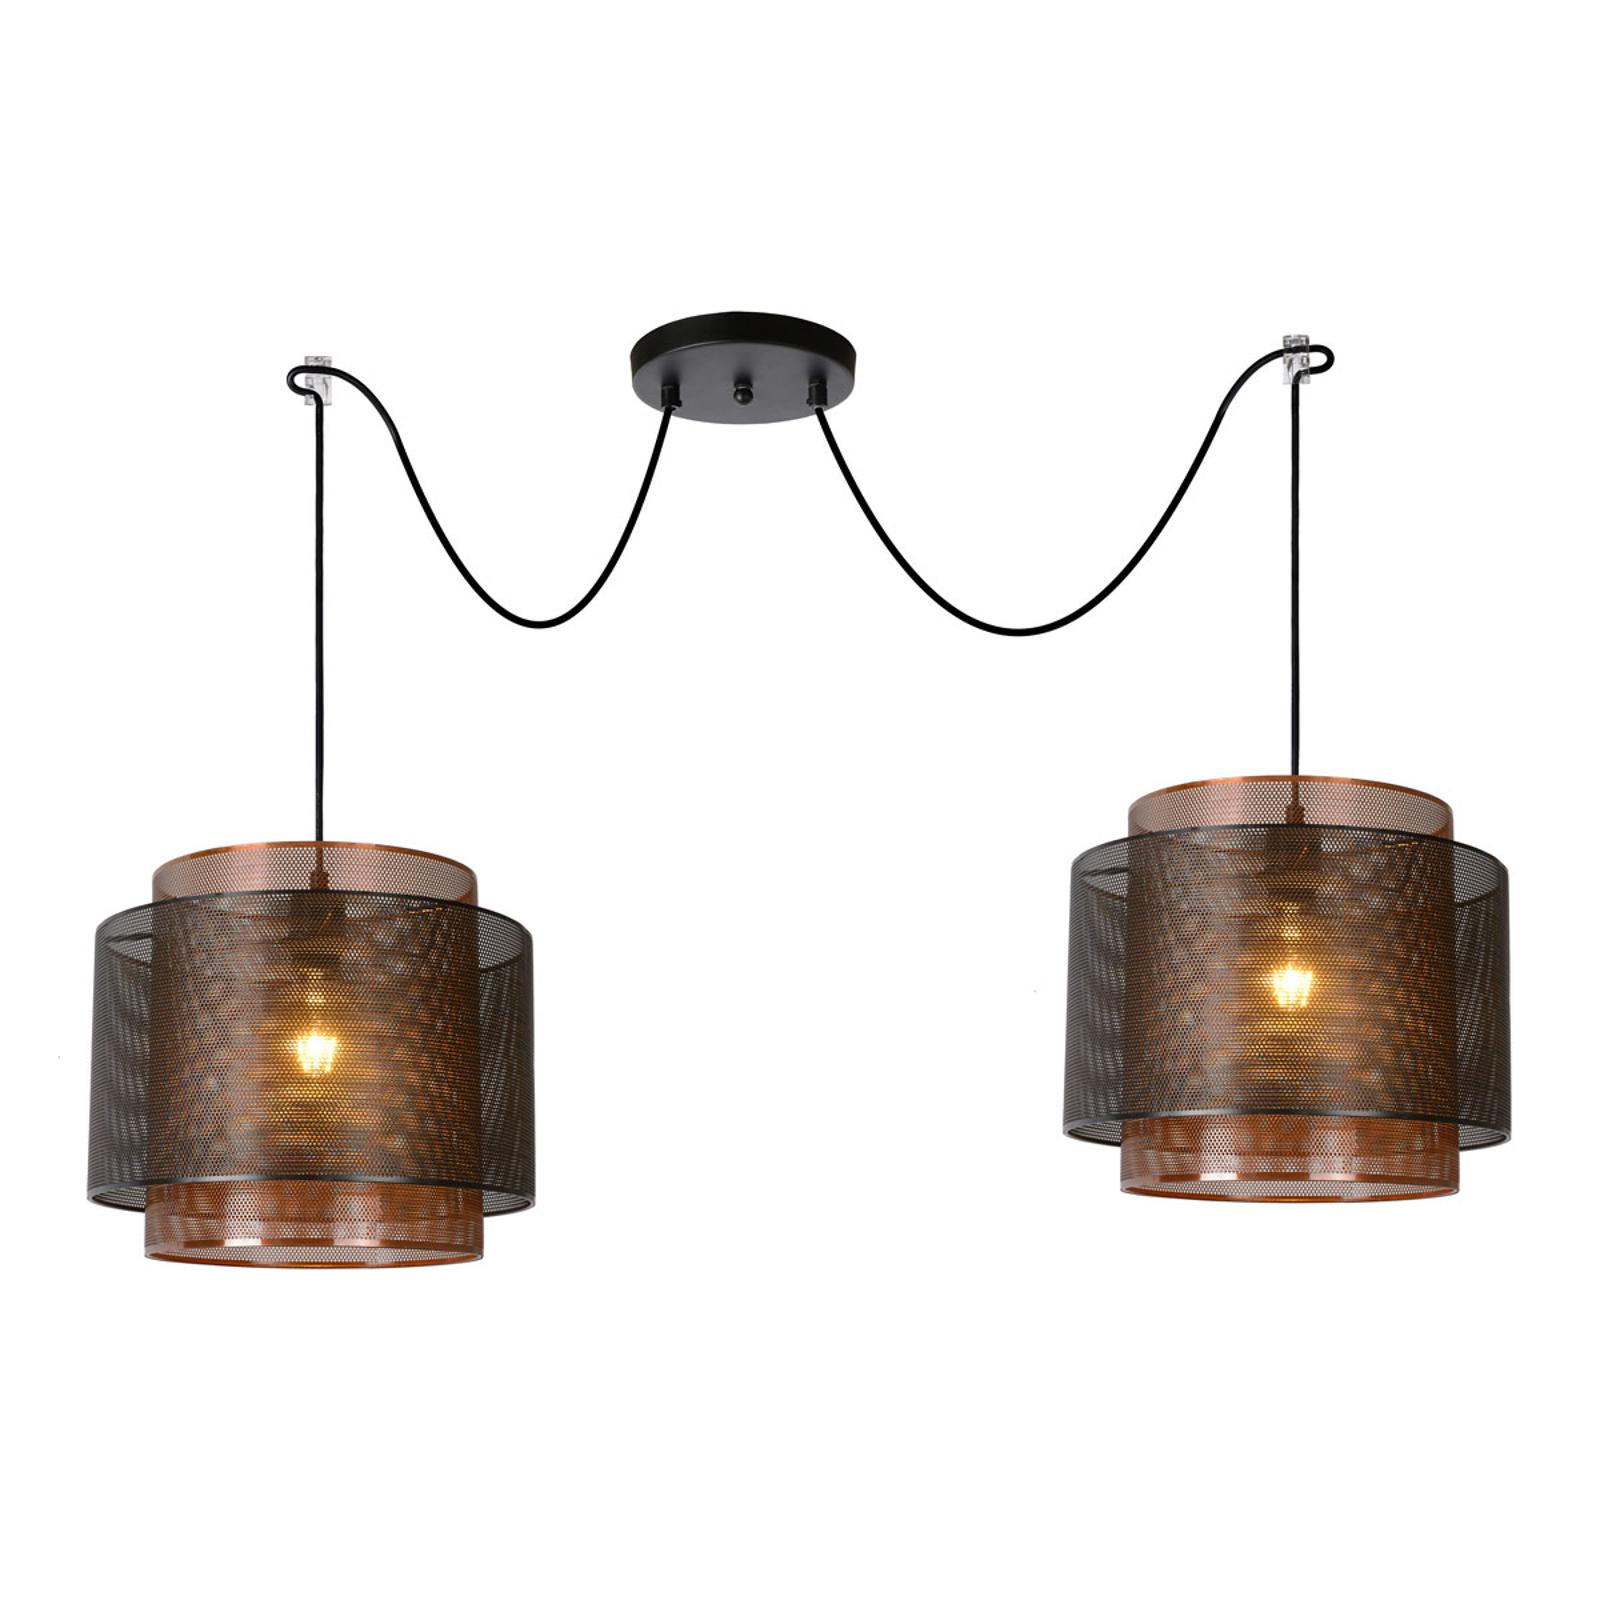 Hanglamp Orrin van metaal, 2-lamps